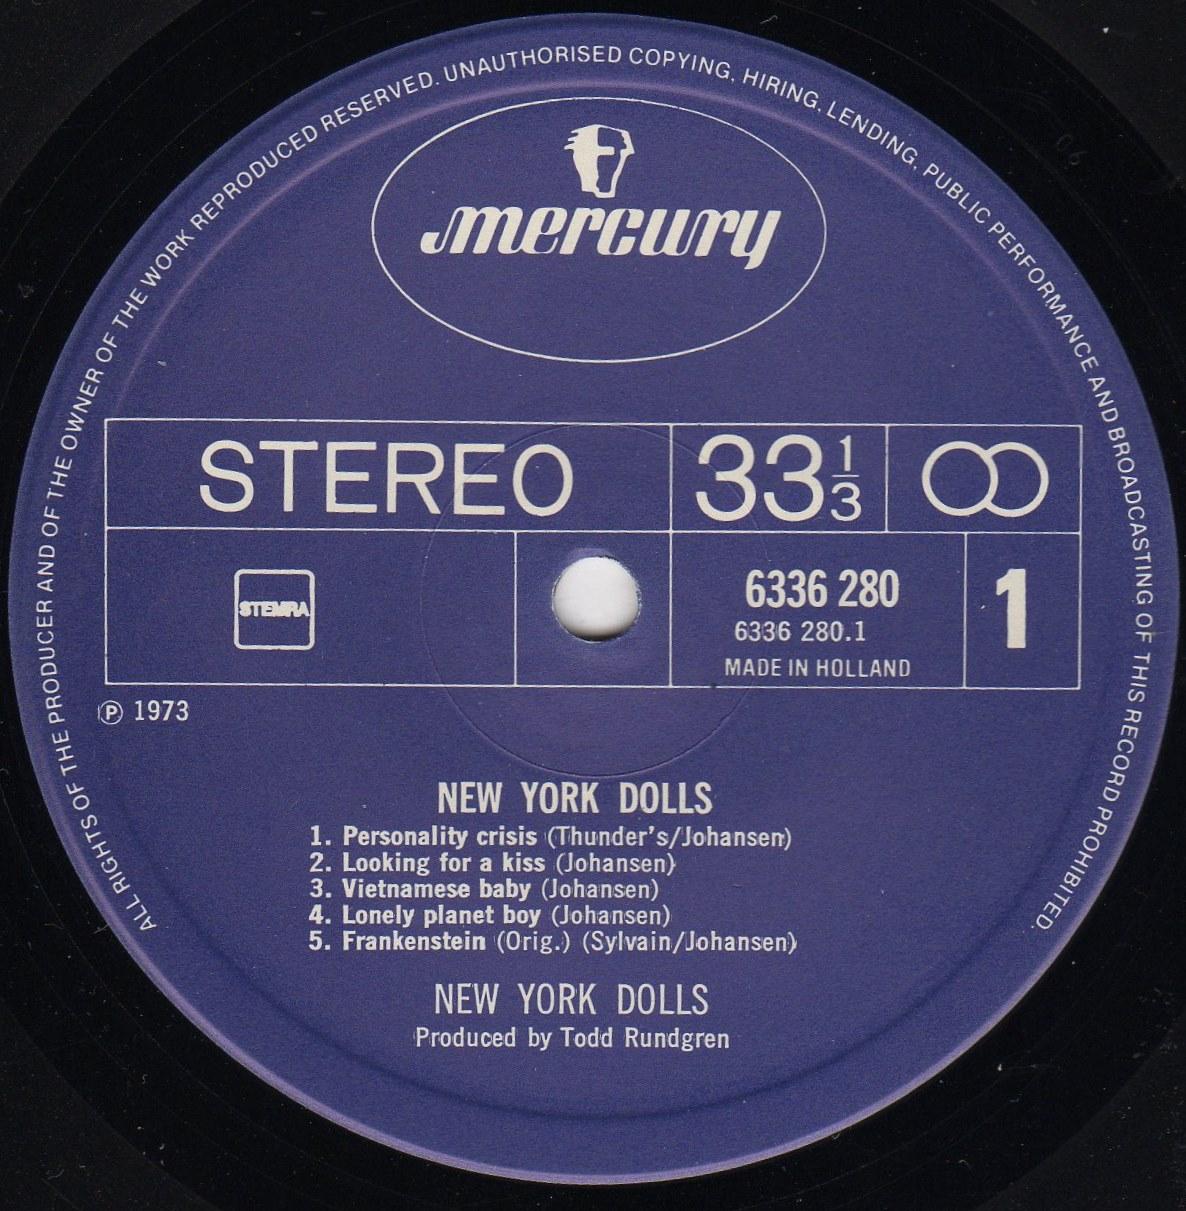 Wolfees Gramophone Vietnamese Baby New York Dolls Mercury Lp 6336